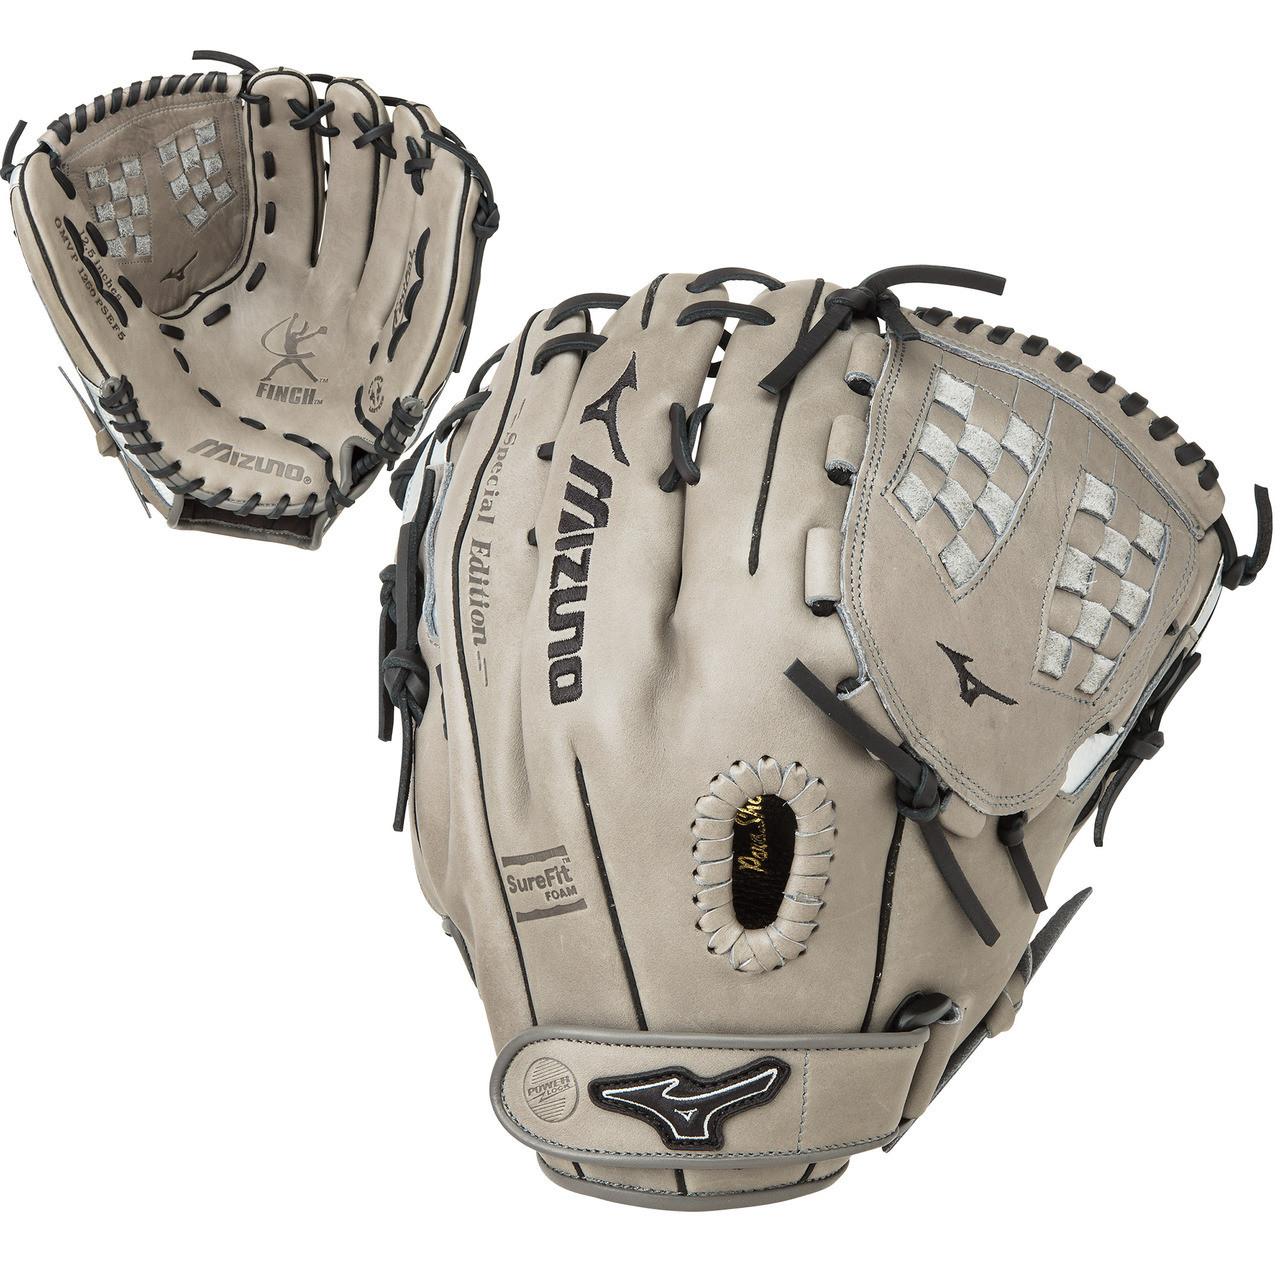 Mizuno MVP Prime SE 12.5 Inch GMVP1250PSEF5 Grey Black Fastpitch Softball  Glove Right Hand Throw - Ballgloves 9a4f14391